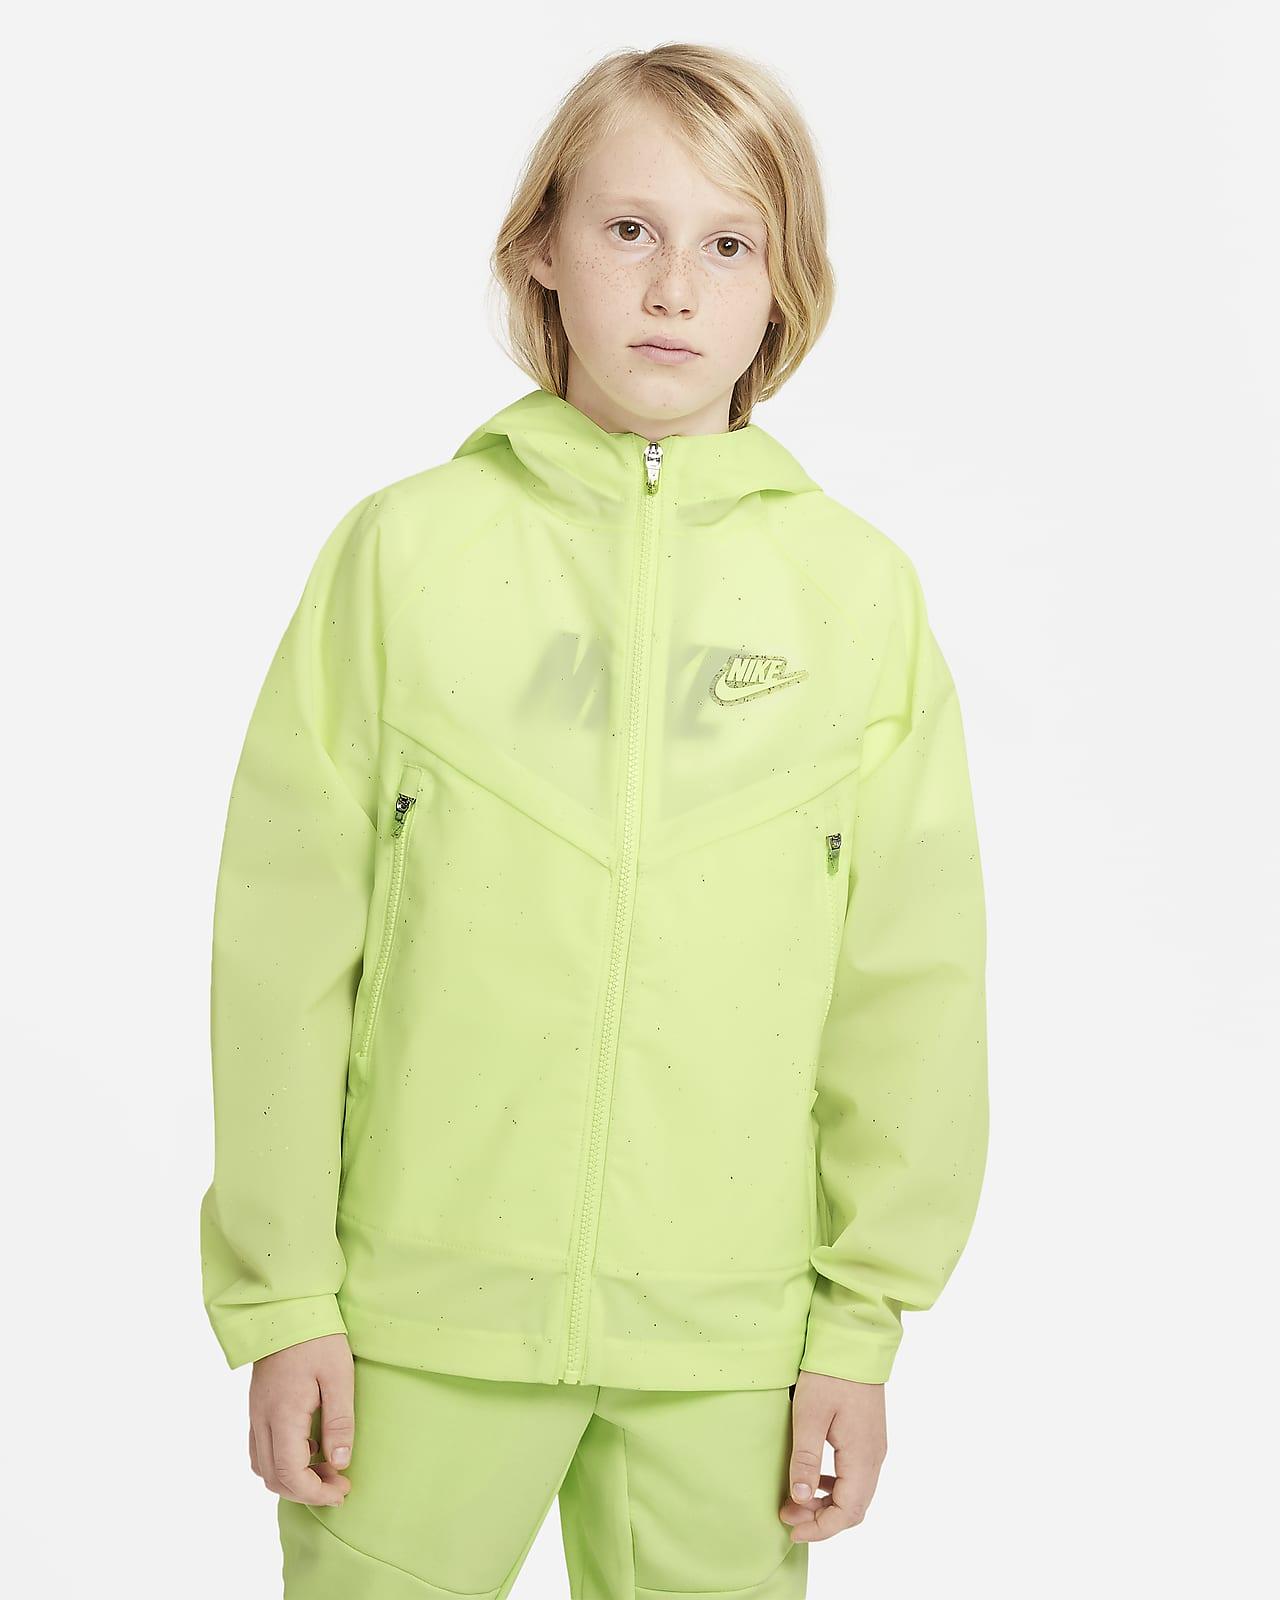 Nike Sportswear Windrunner Zero kapucnis kabát nagyobb gyerekeknek